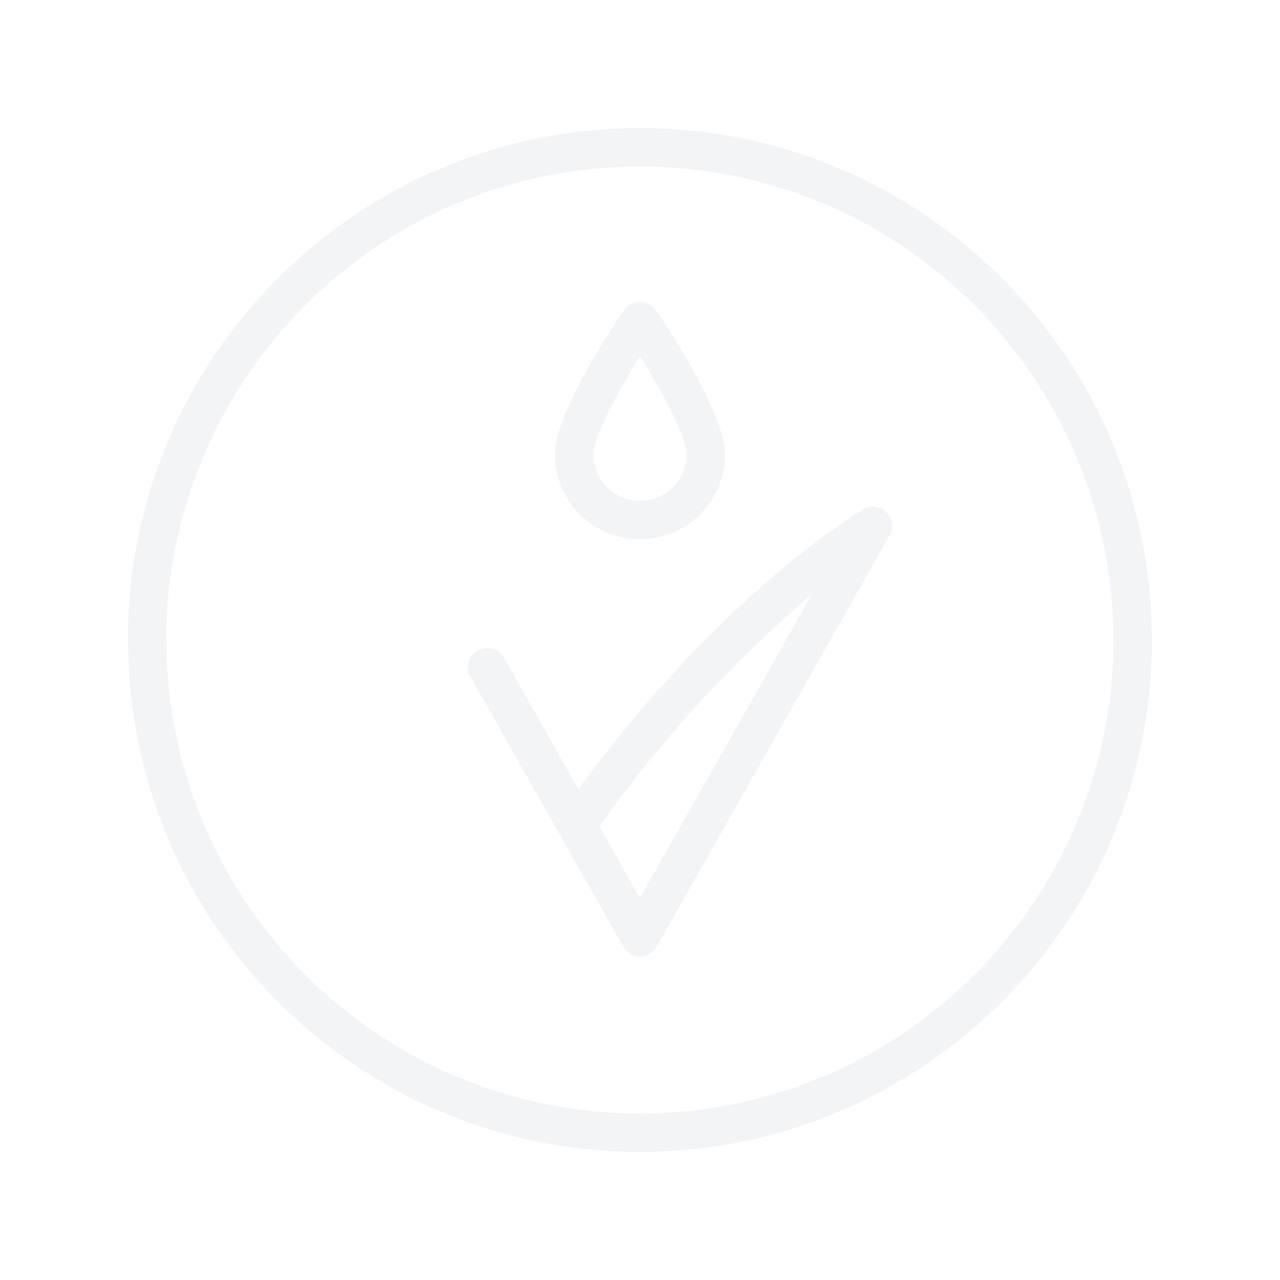 LIERAC Lift Integral Sculpting Cream 50ml